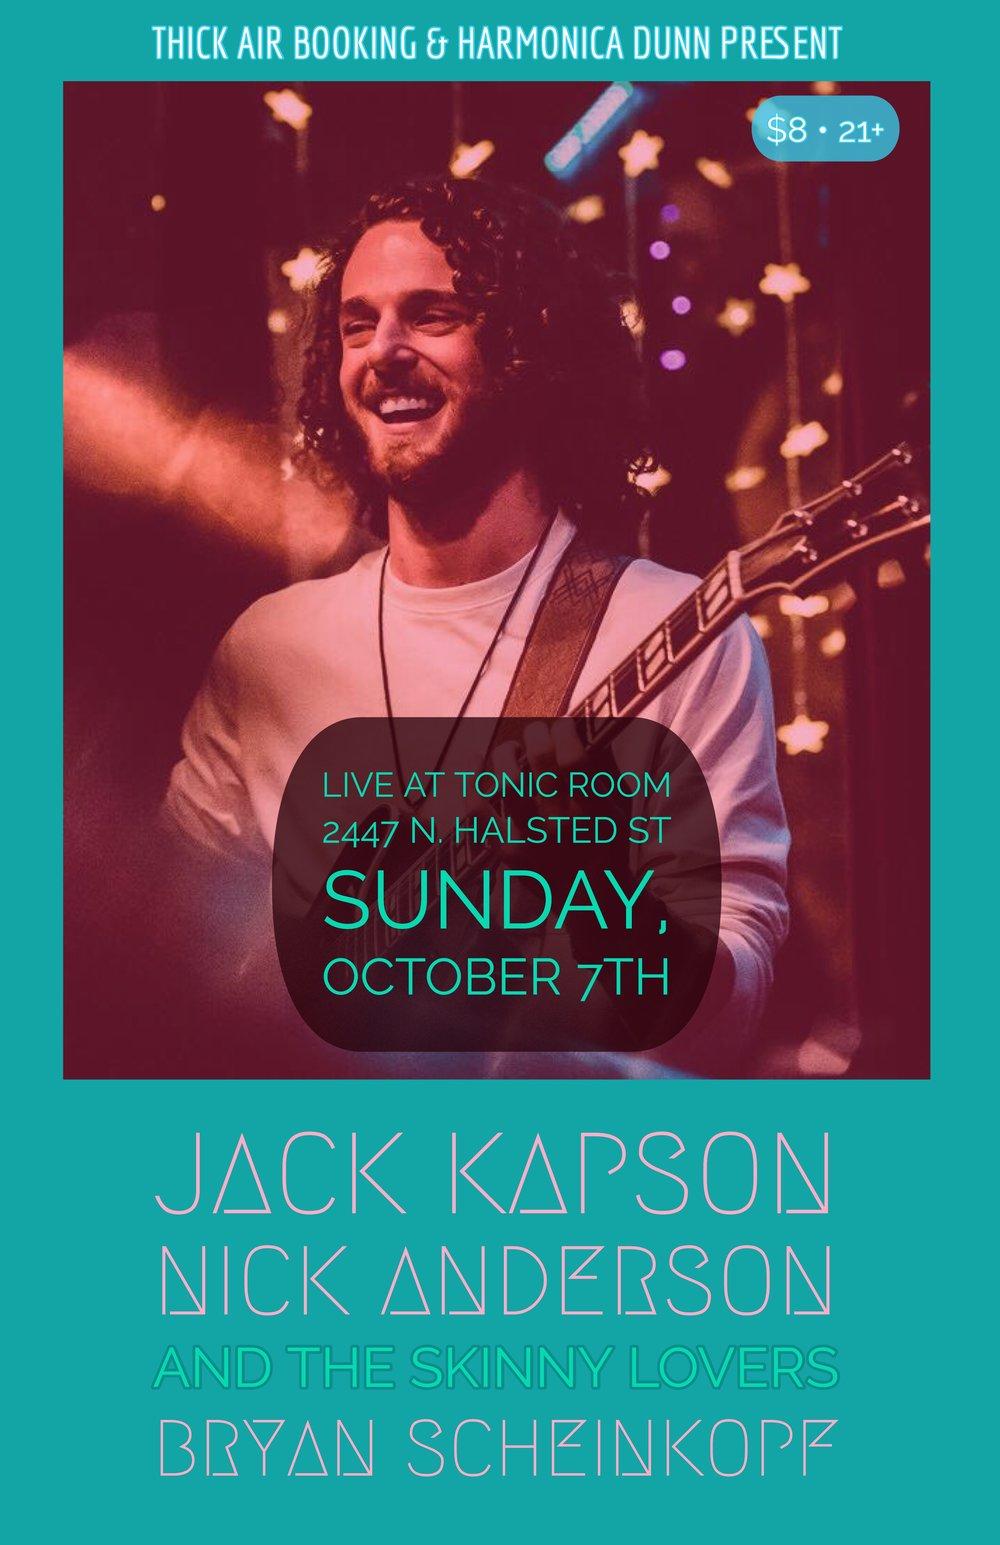 Jack Kapson Tonic Room Poster.jpg